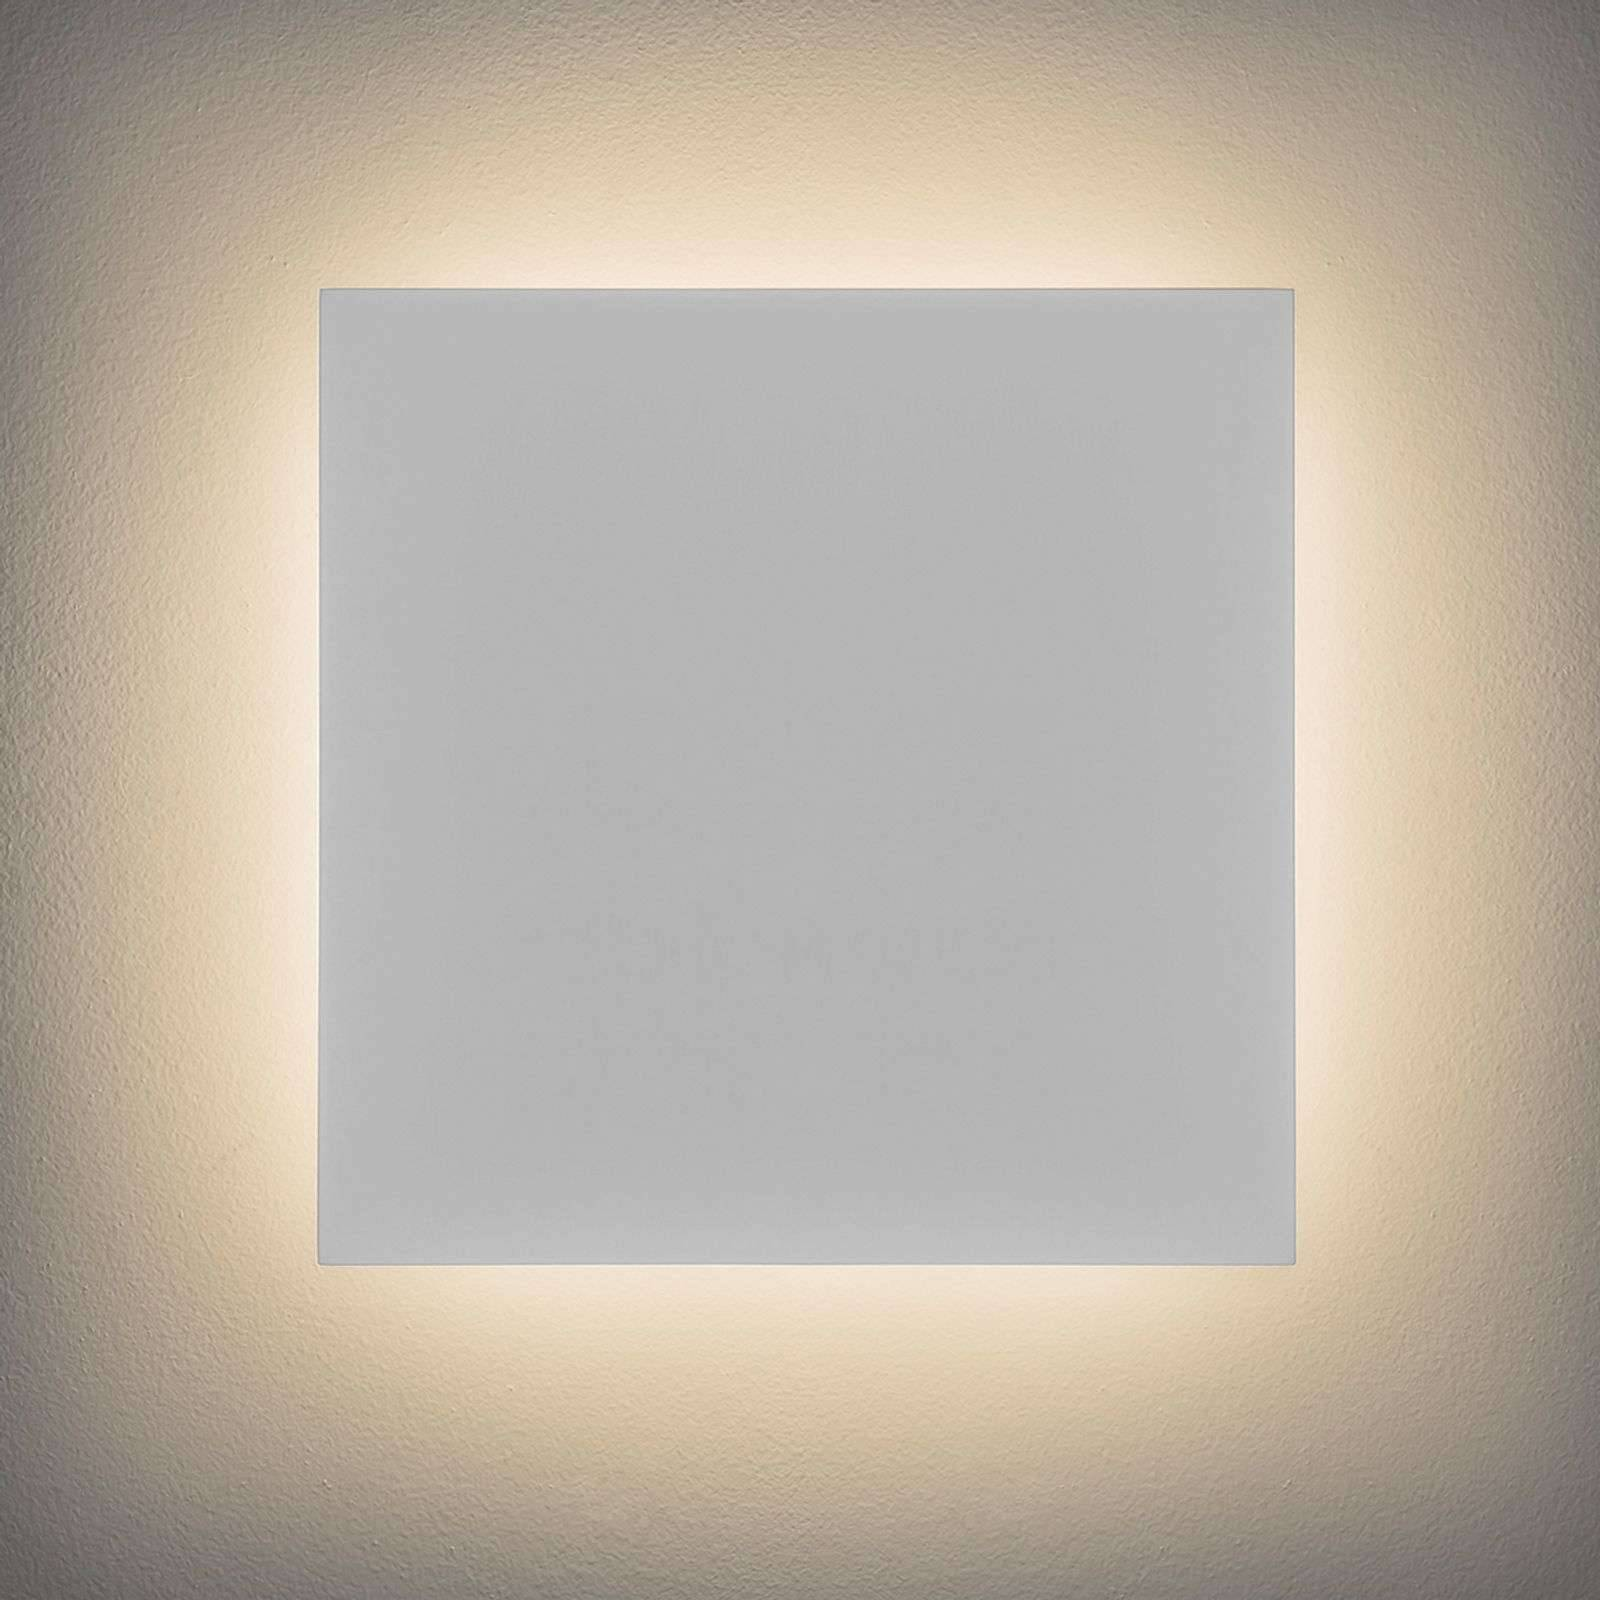 Astro Applique LED Eclipse Square 300